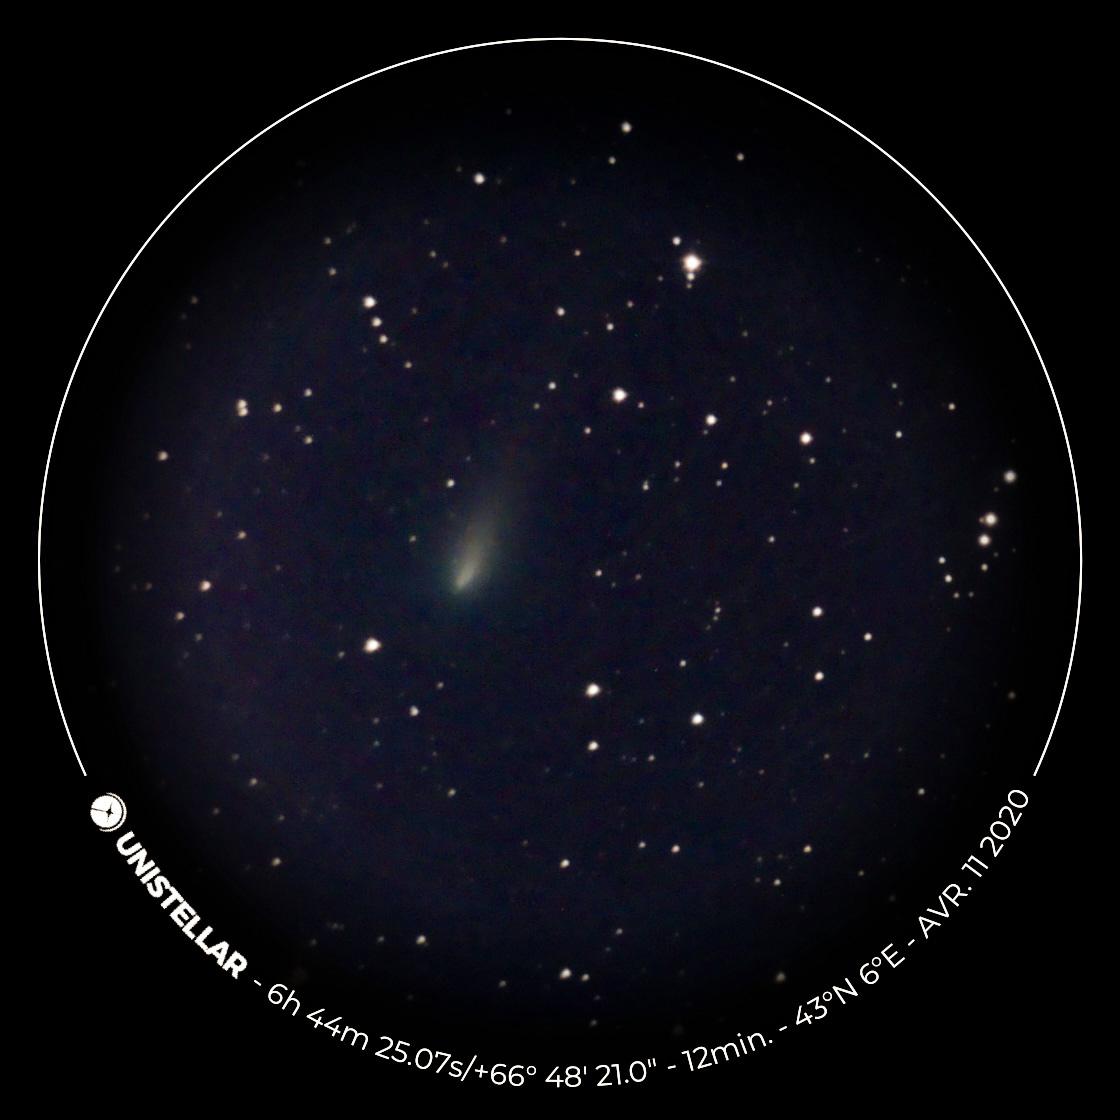 eVscope-20200411-202731.jpg